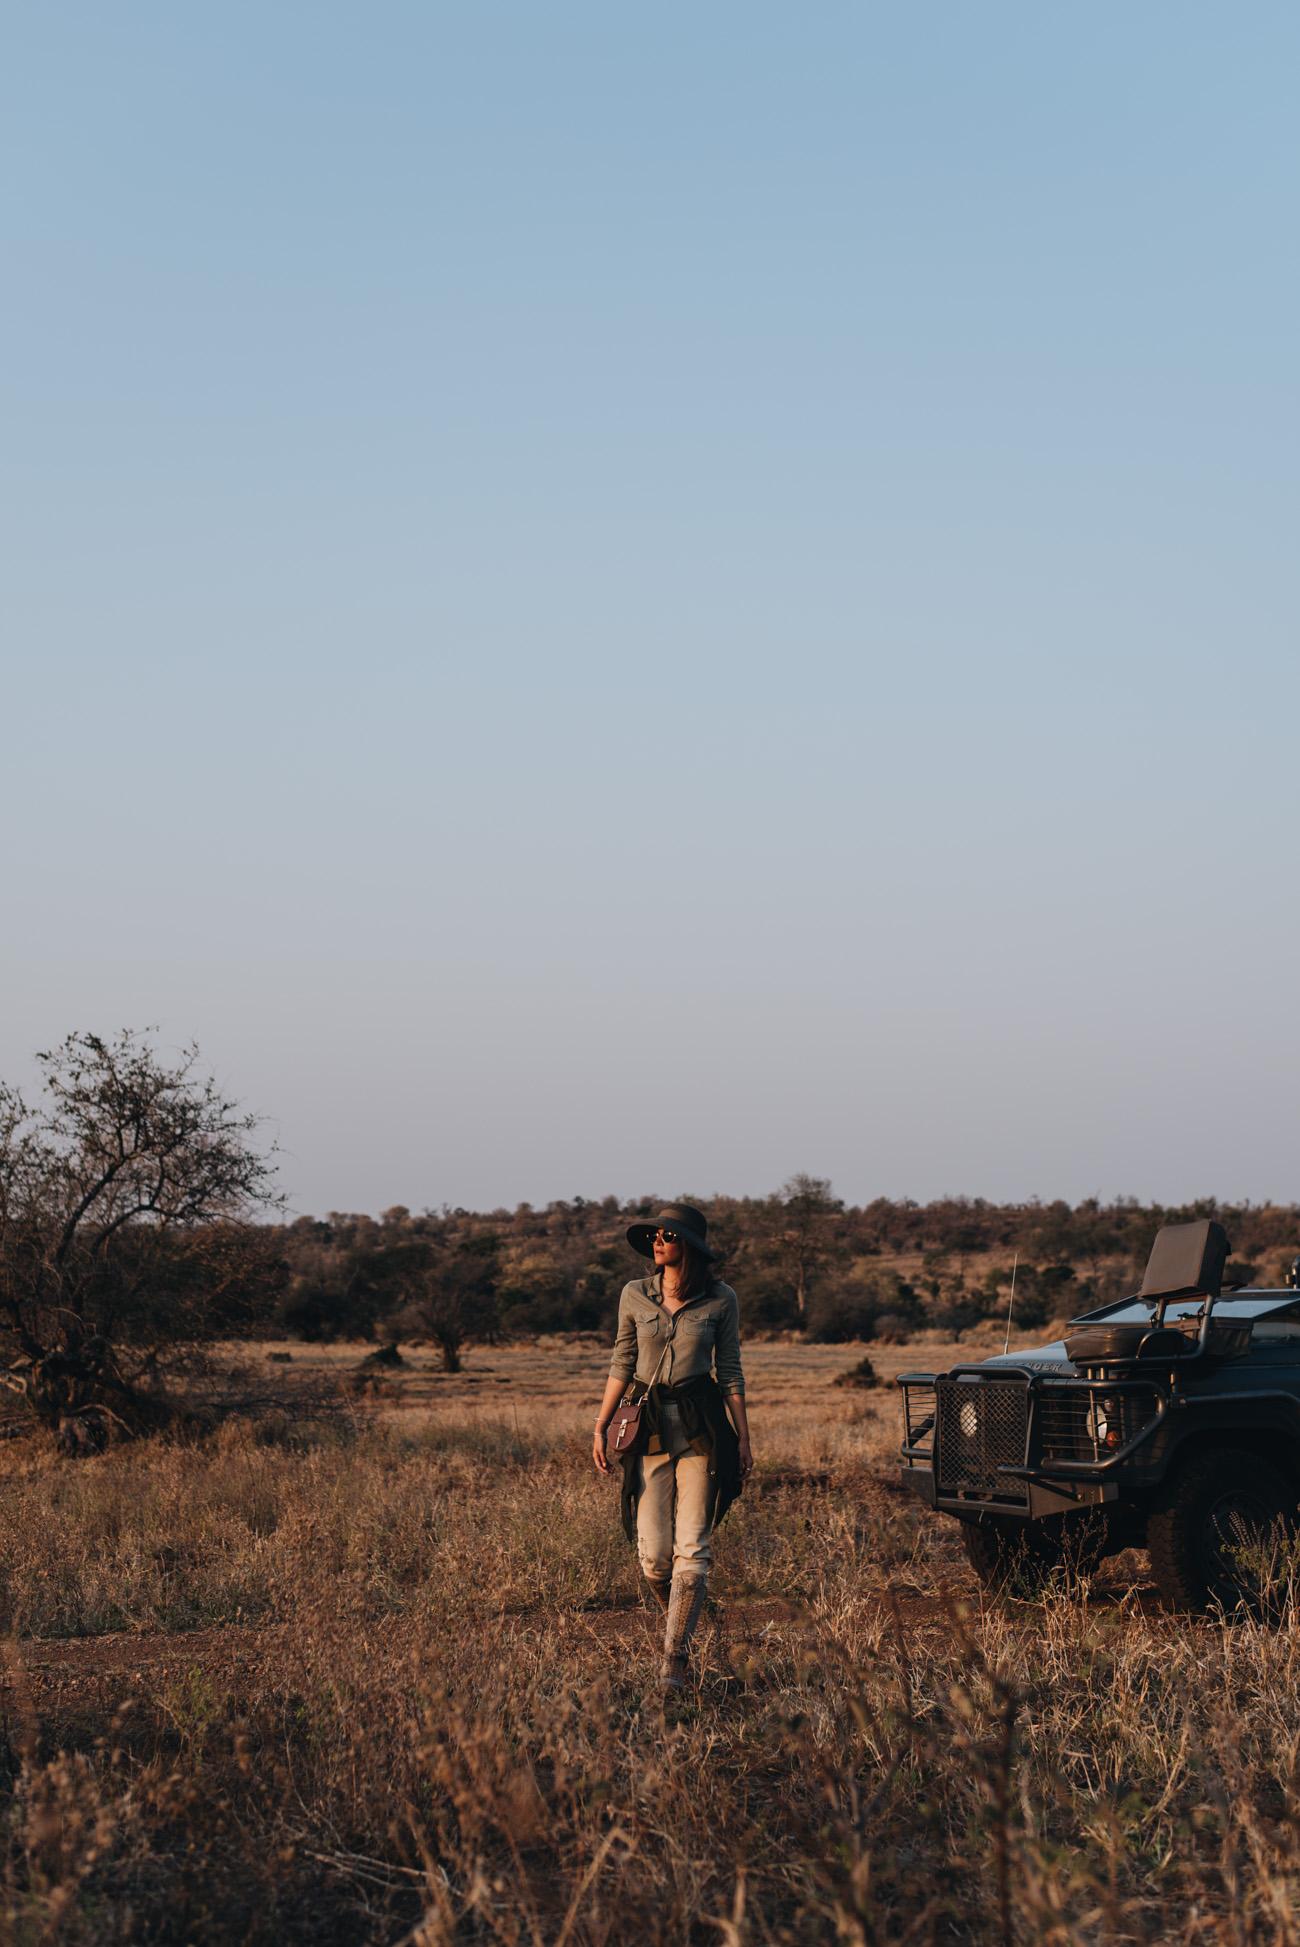 Safari-Guide-Afrika-Krüger-Nationalpark-singita-park-fashiioncarpet-nina-schwichtenberg